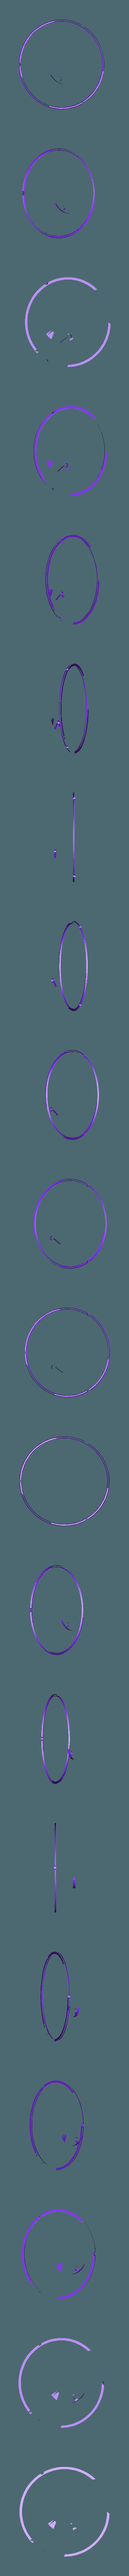 roof2_2_gears.stl Download free STL file Bird Feeder • Model to 3D print, gobo38